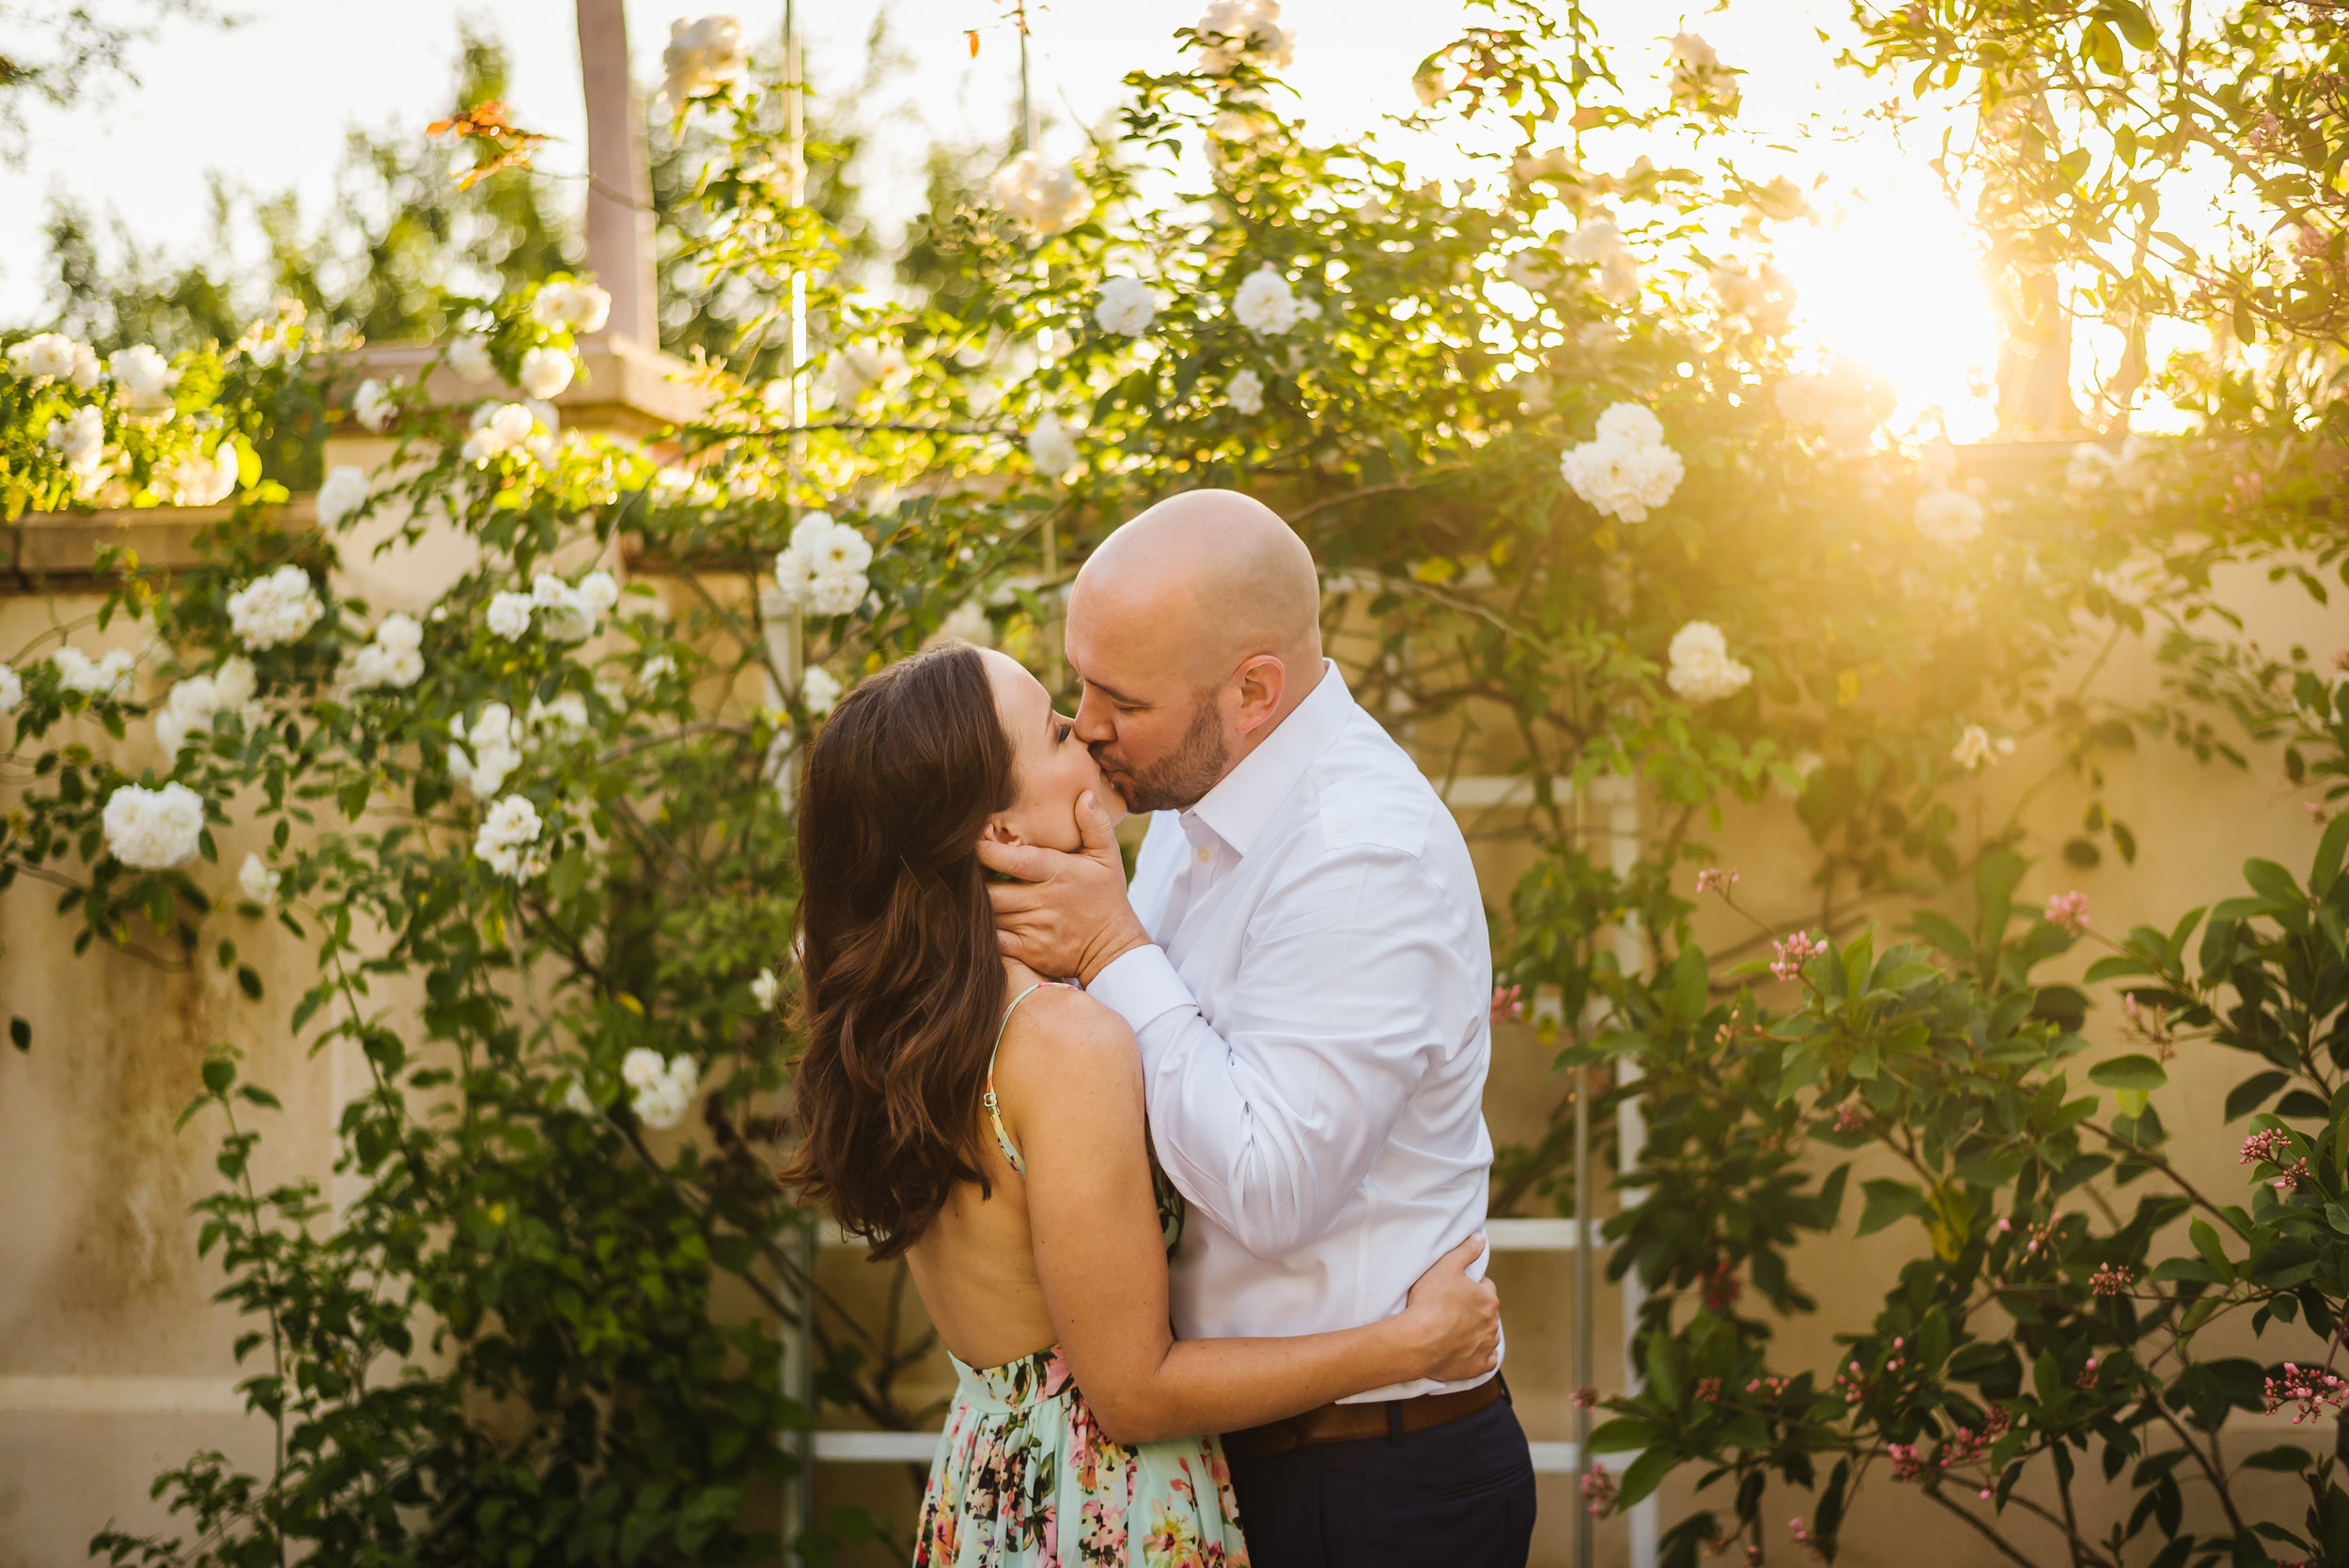 Tampa-Engagement-Photographer-Sunset-Romantic.jpg